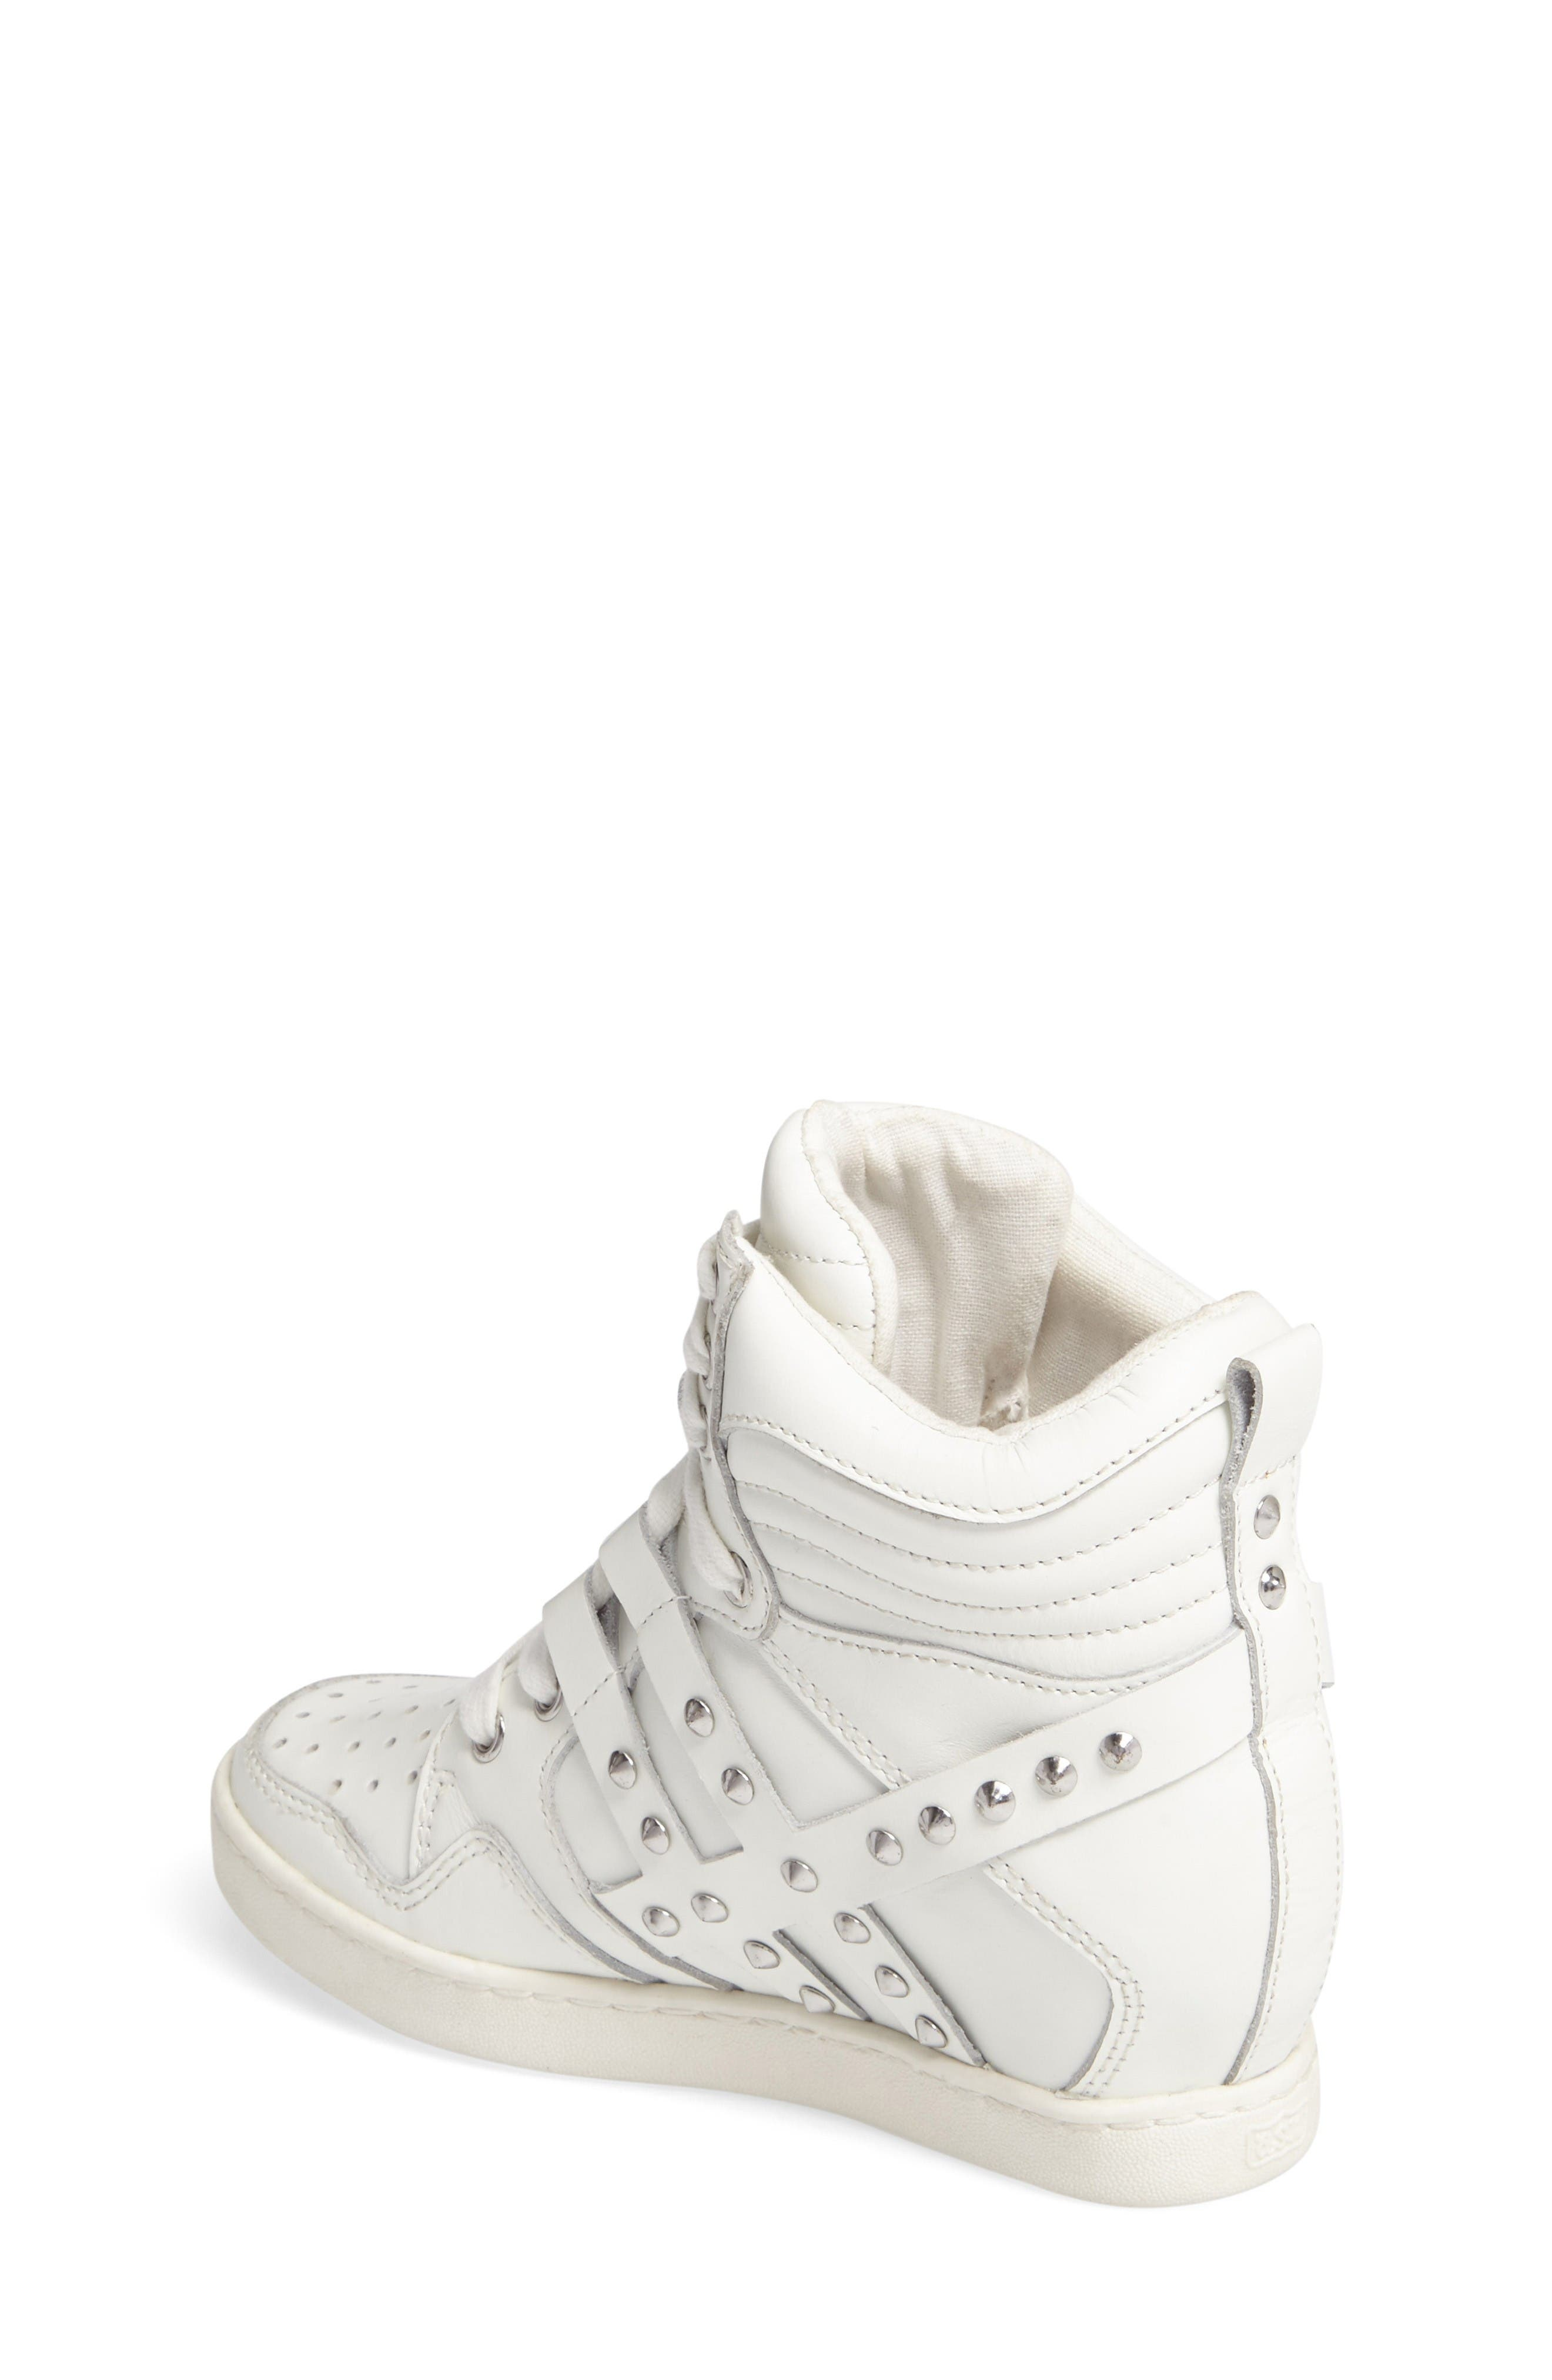 Alternate Image 2  - Ash Boogie Studs High Top Sneaker (Toddler, Little Kid & Big Kid)